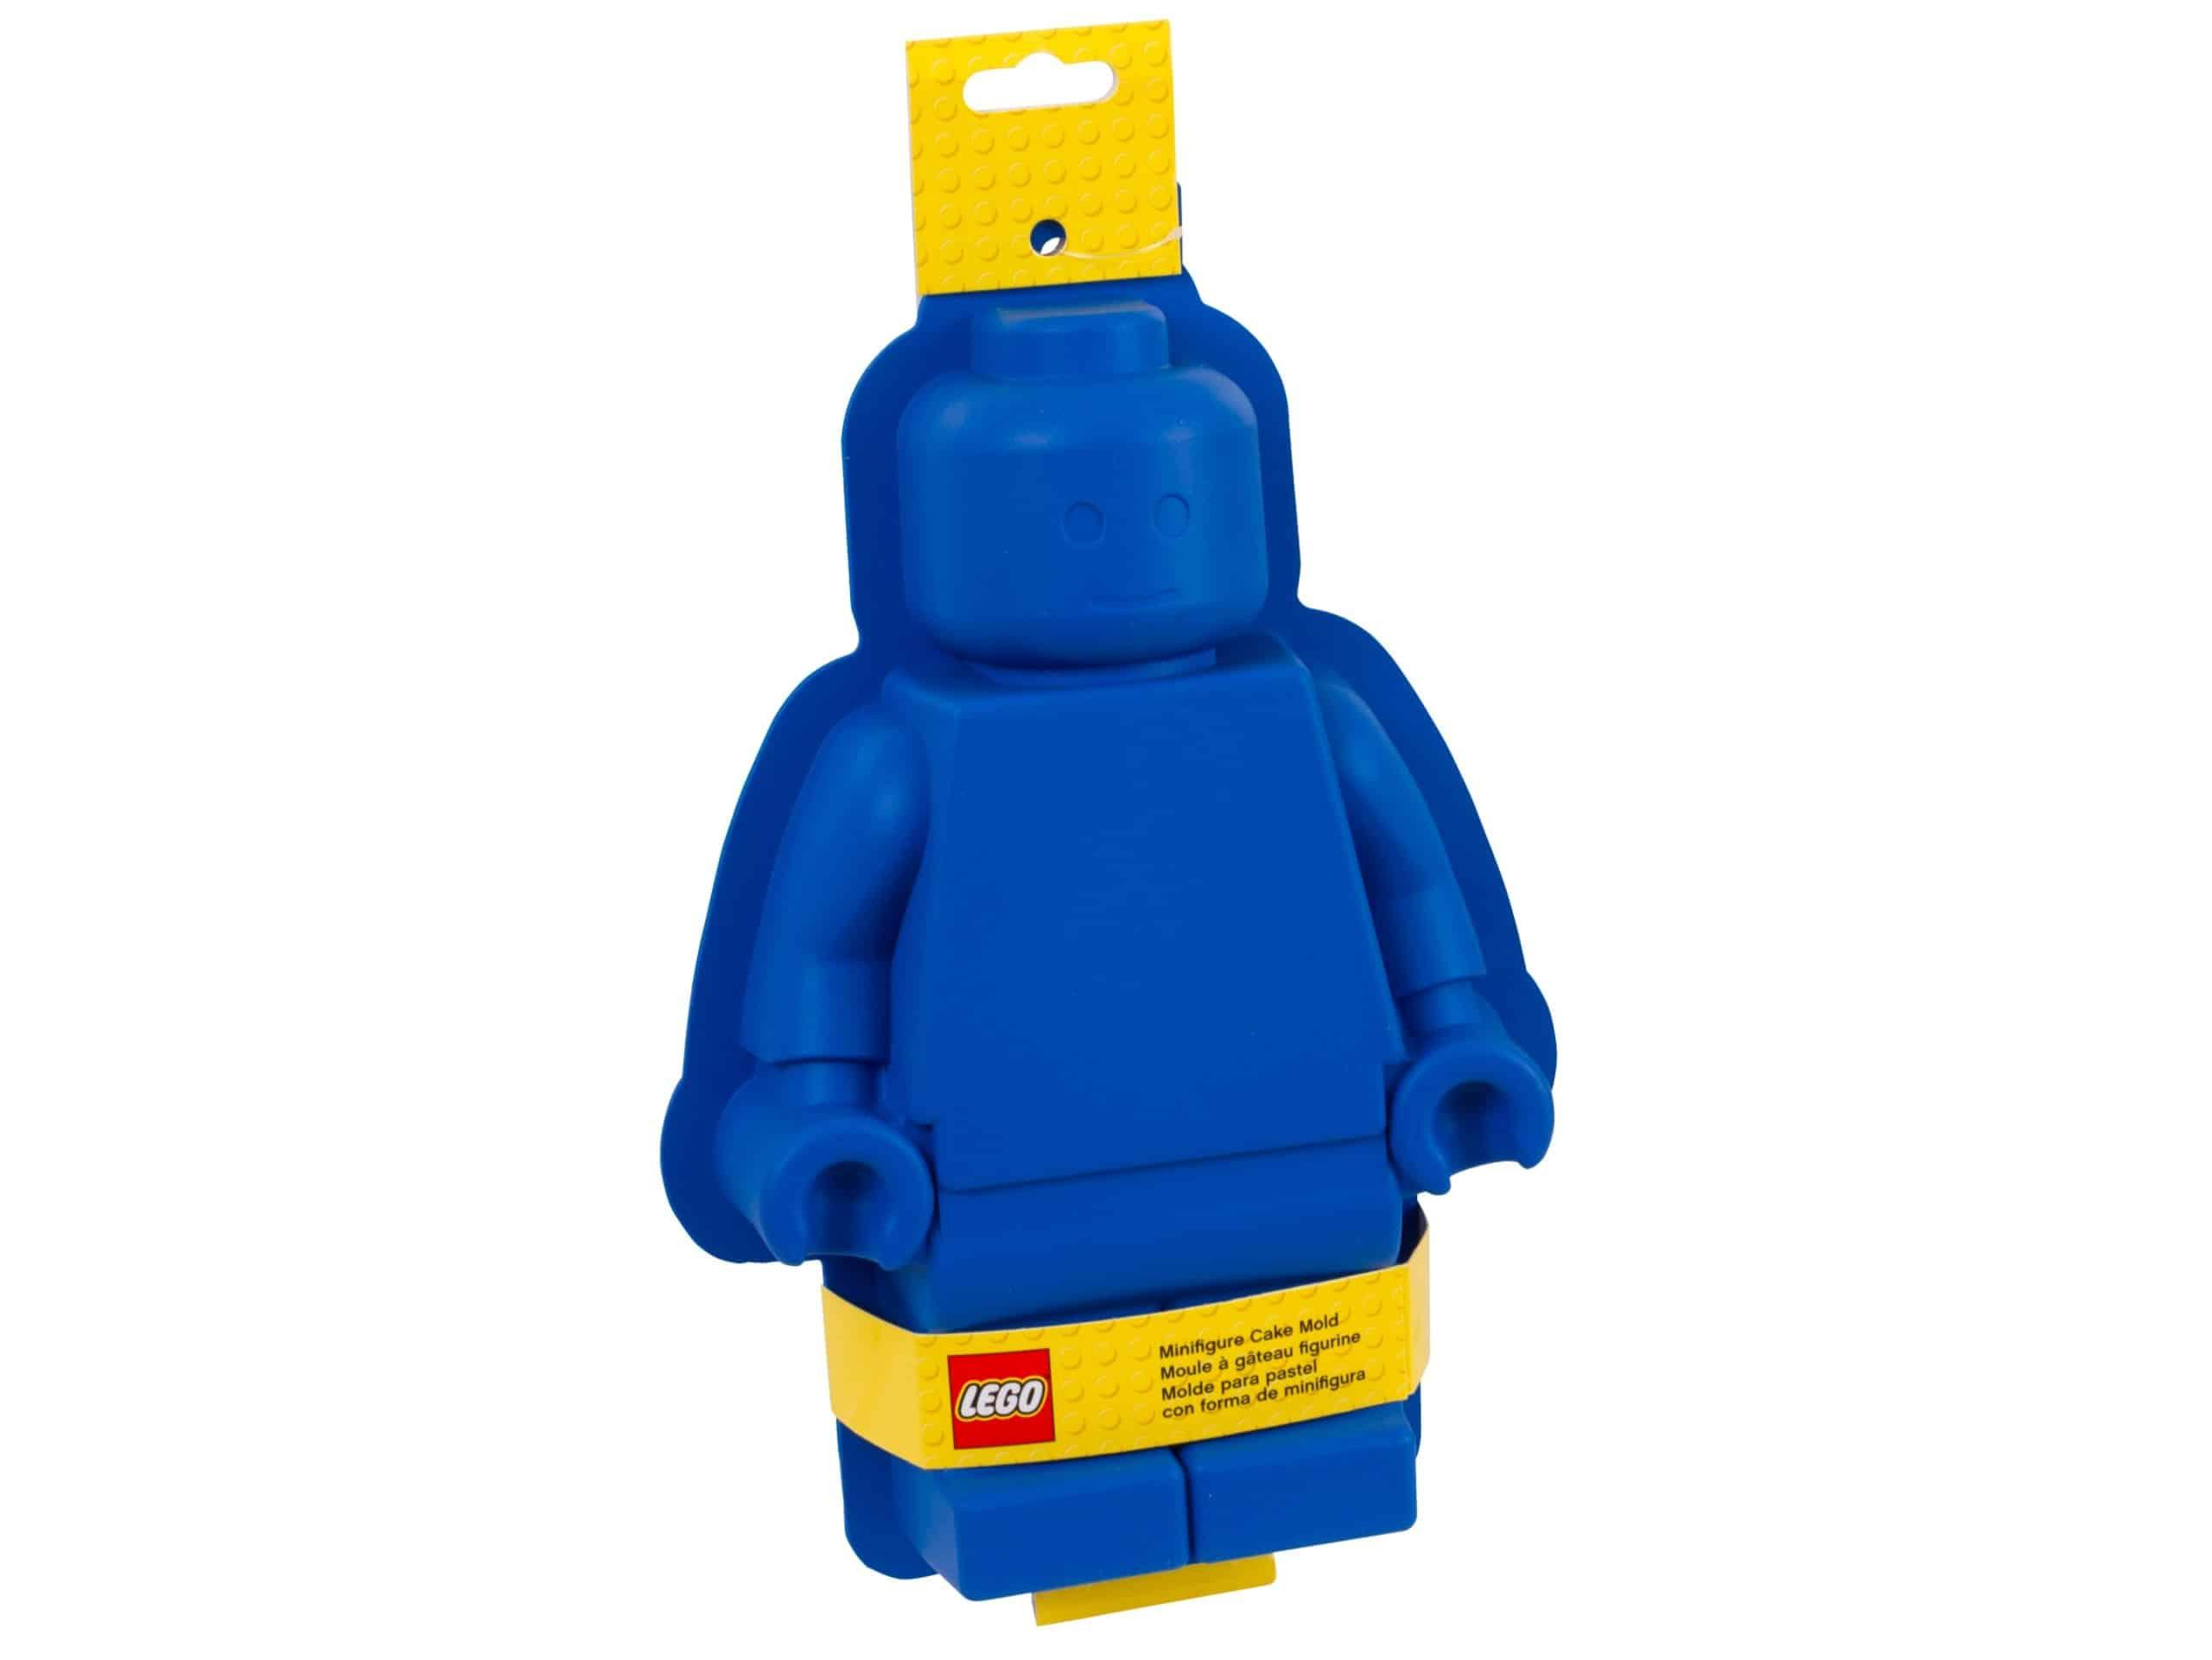 lego 853575 minifigur kakform scaled